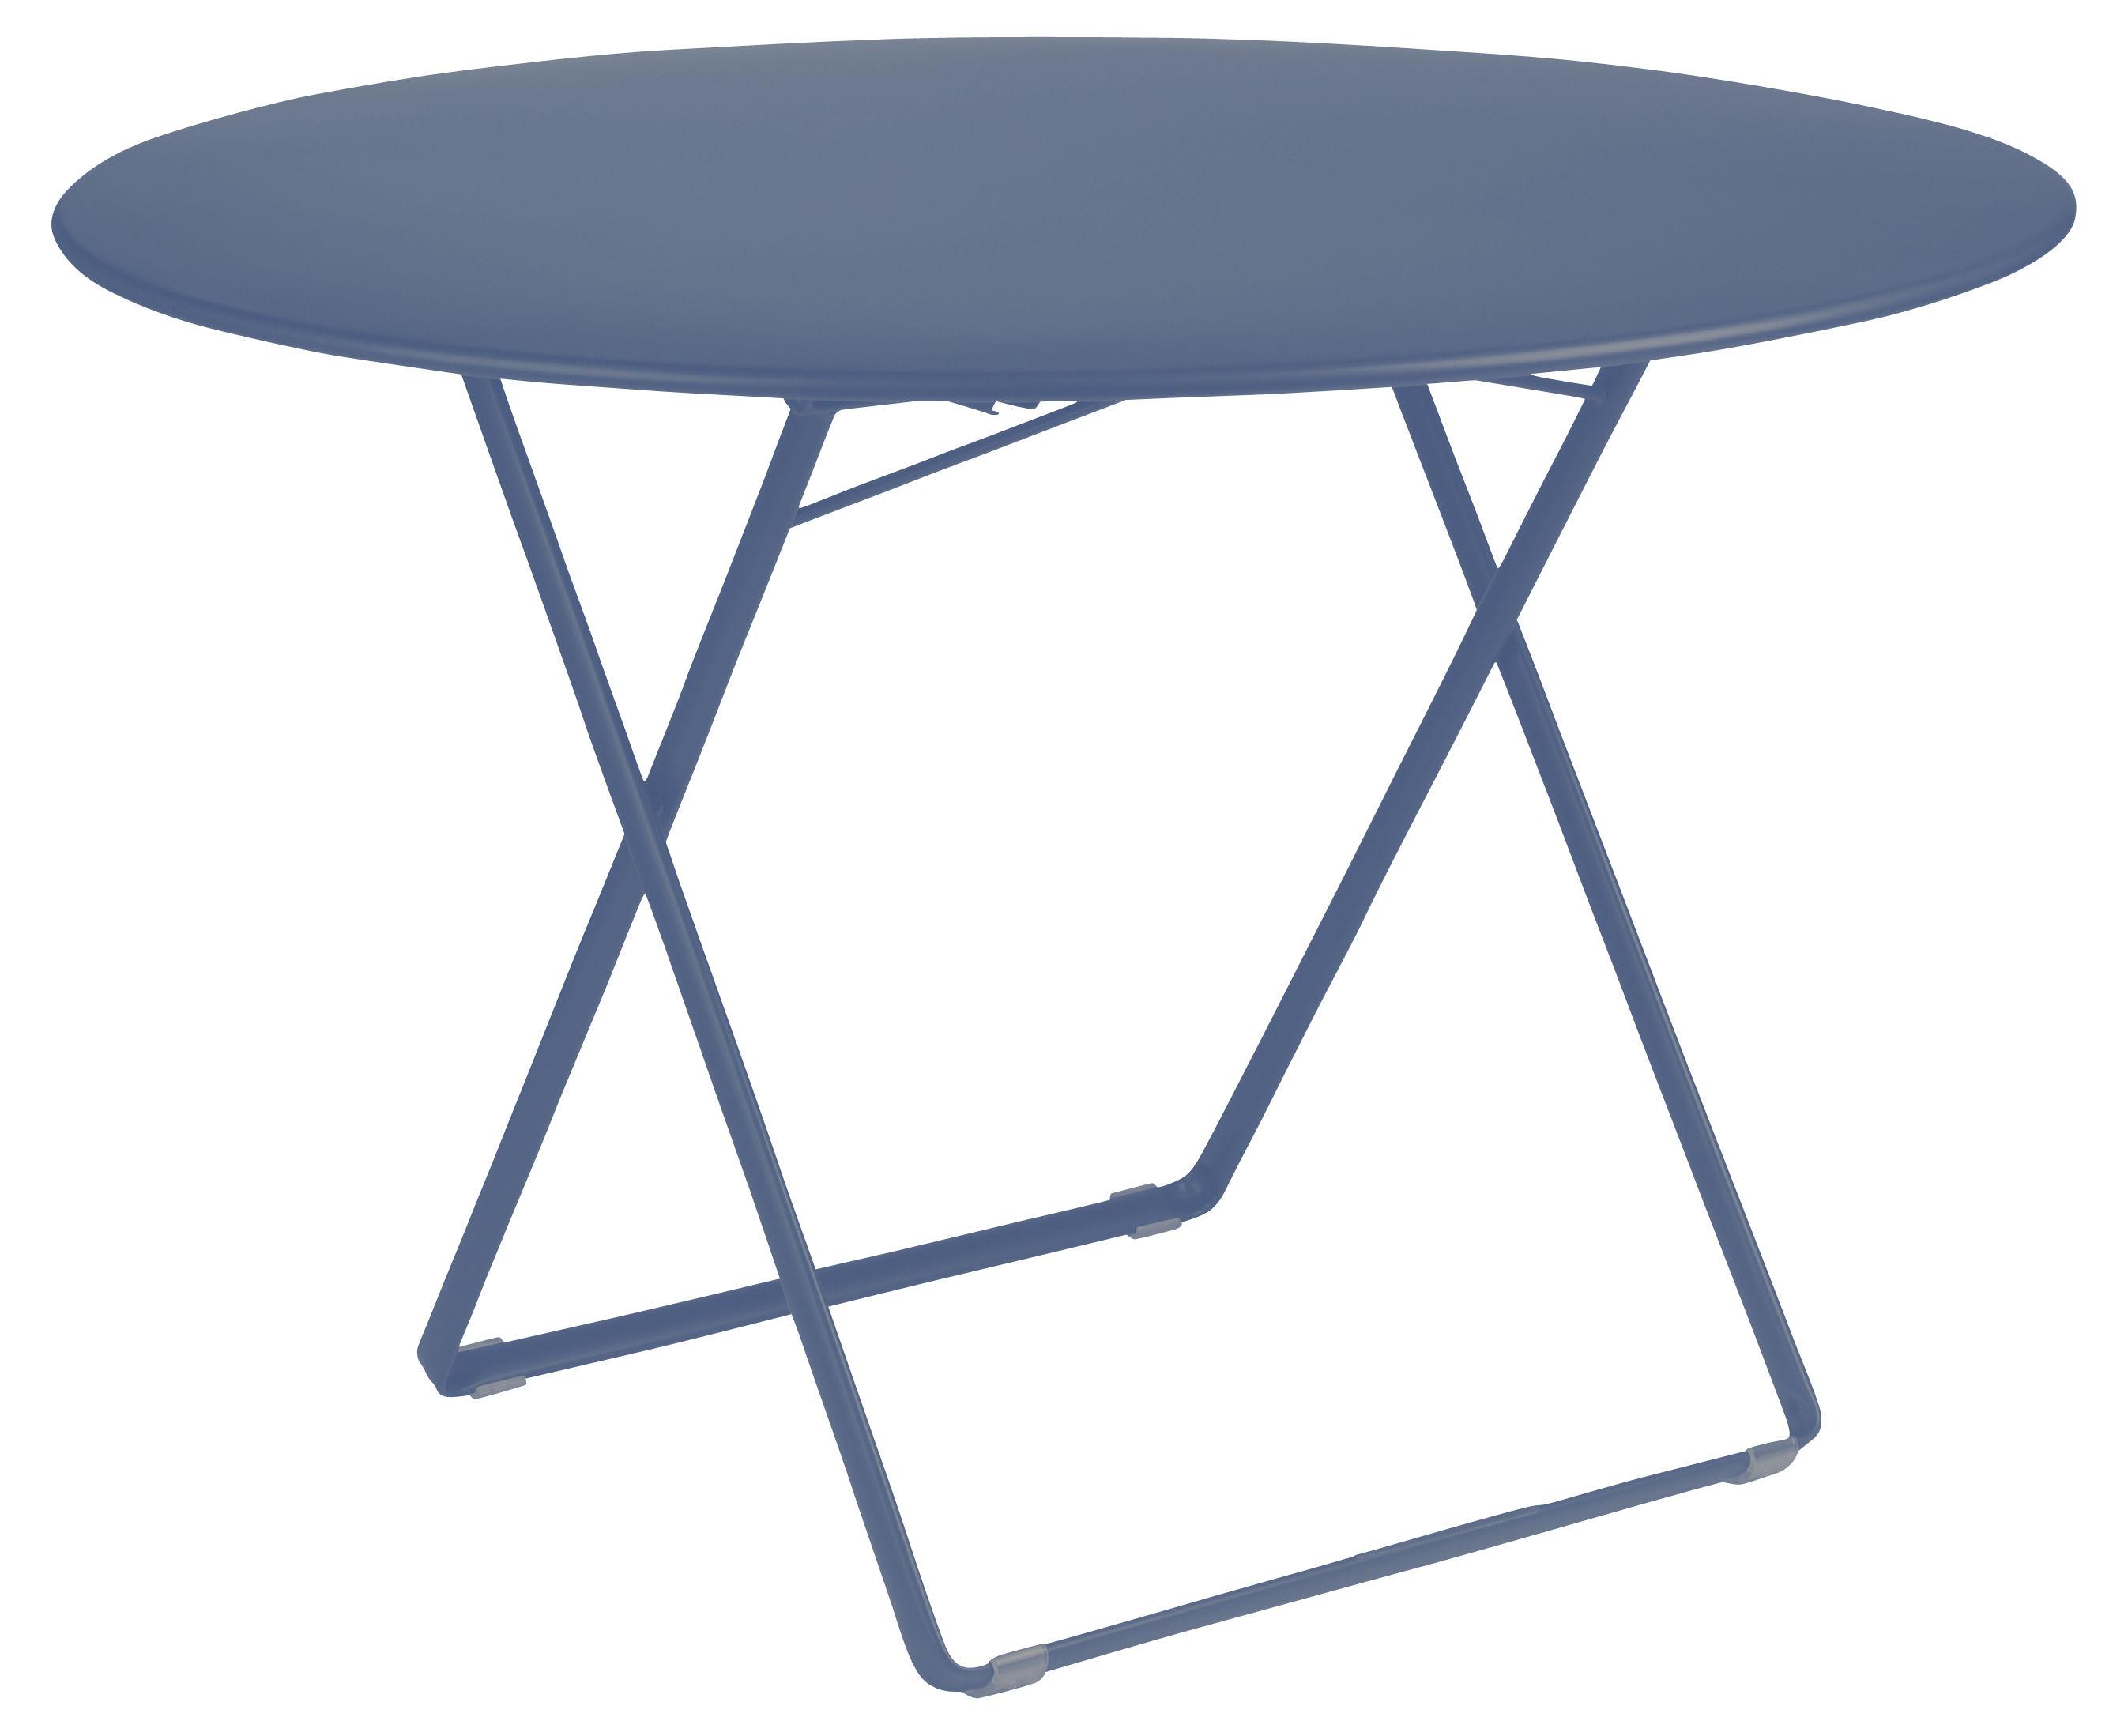 Scopri tavolo da giardino plein air tavolo rotondo 120 for Tavolo rotondo 120 cm